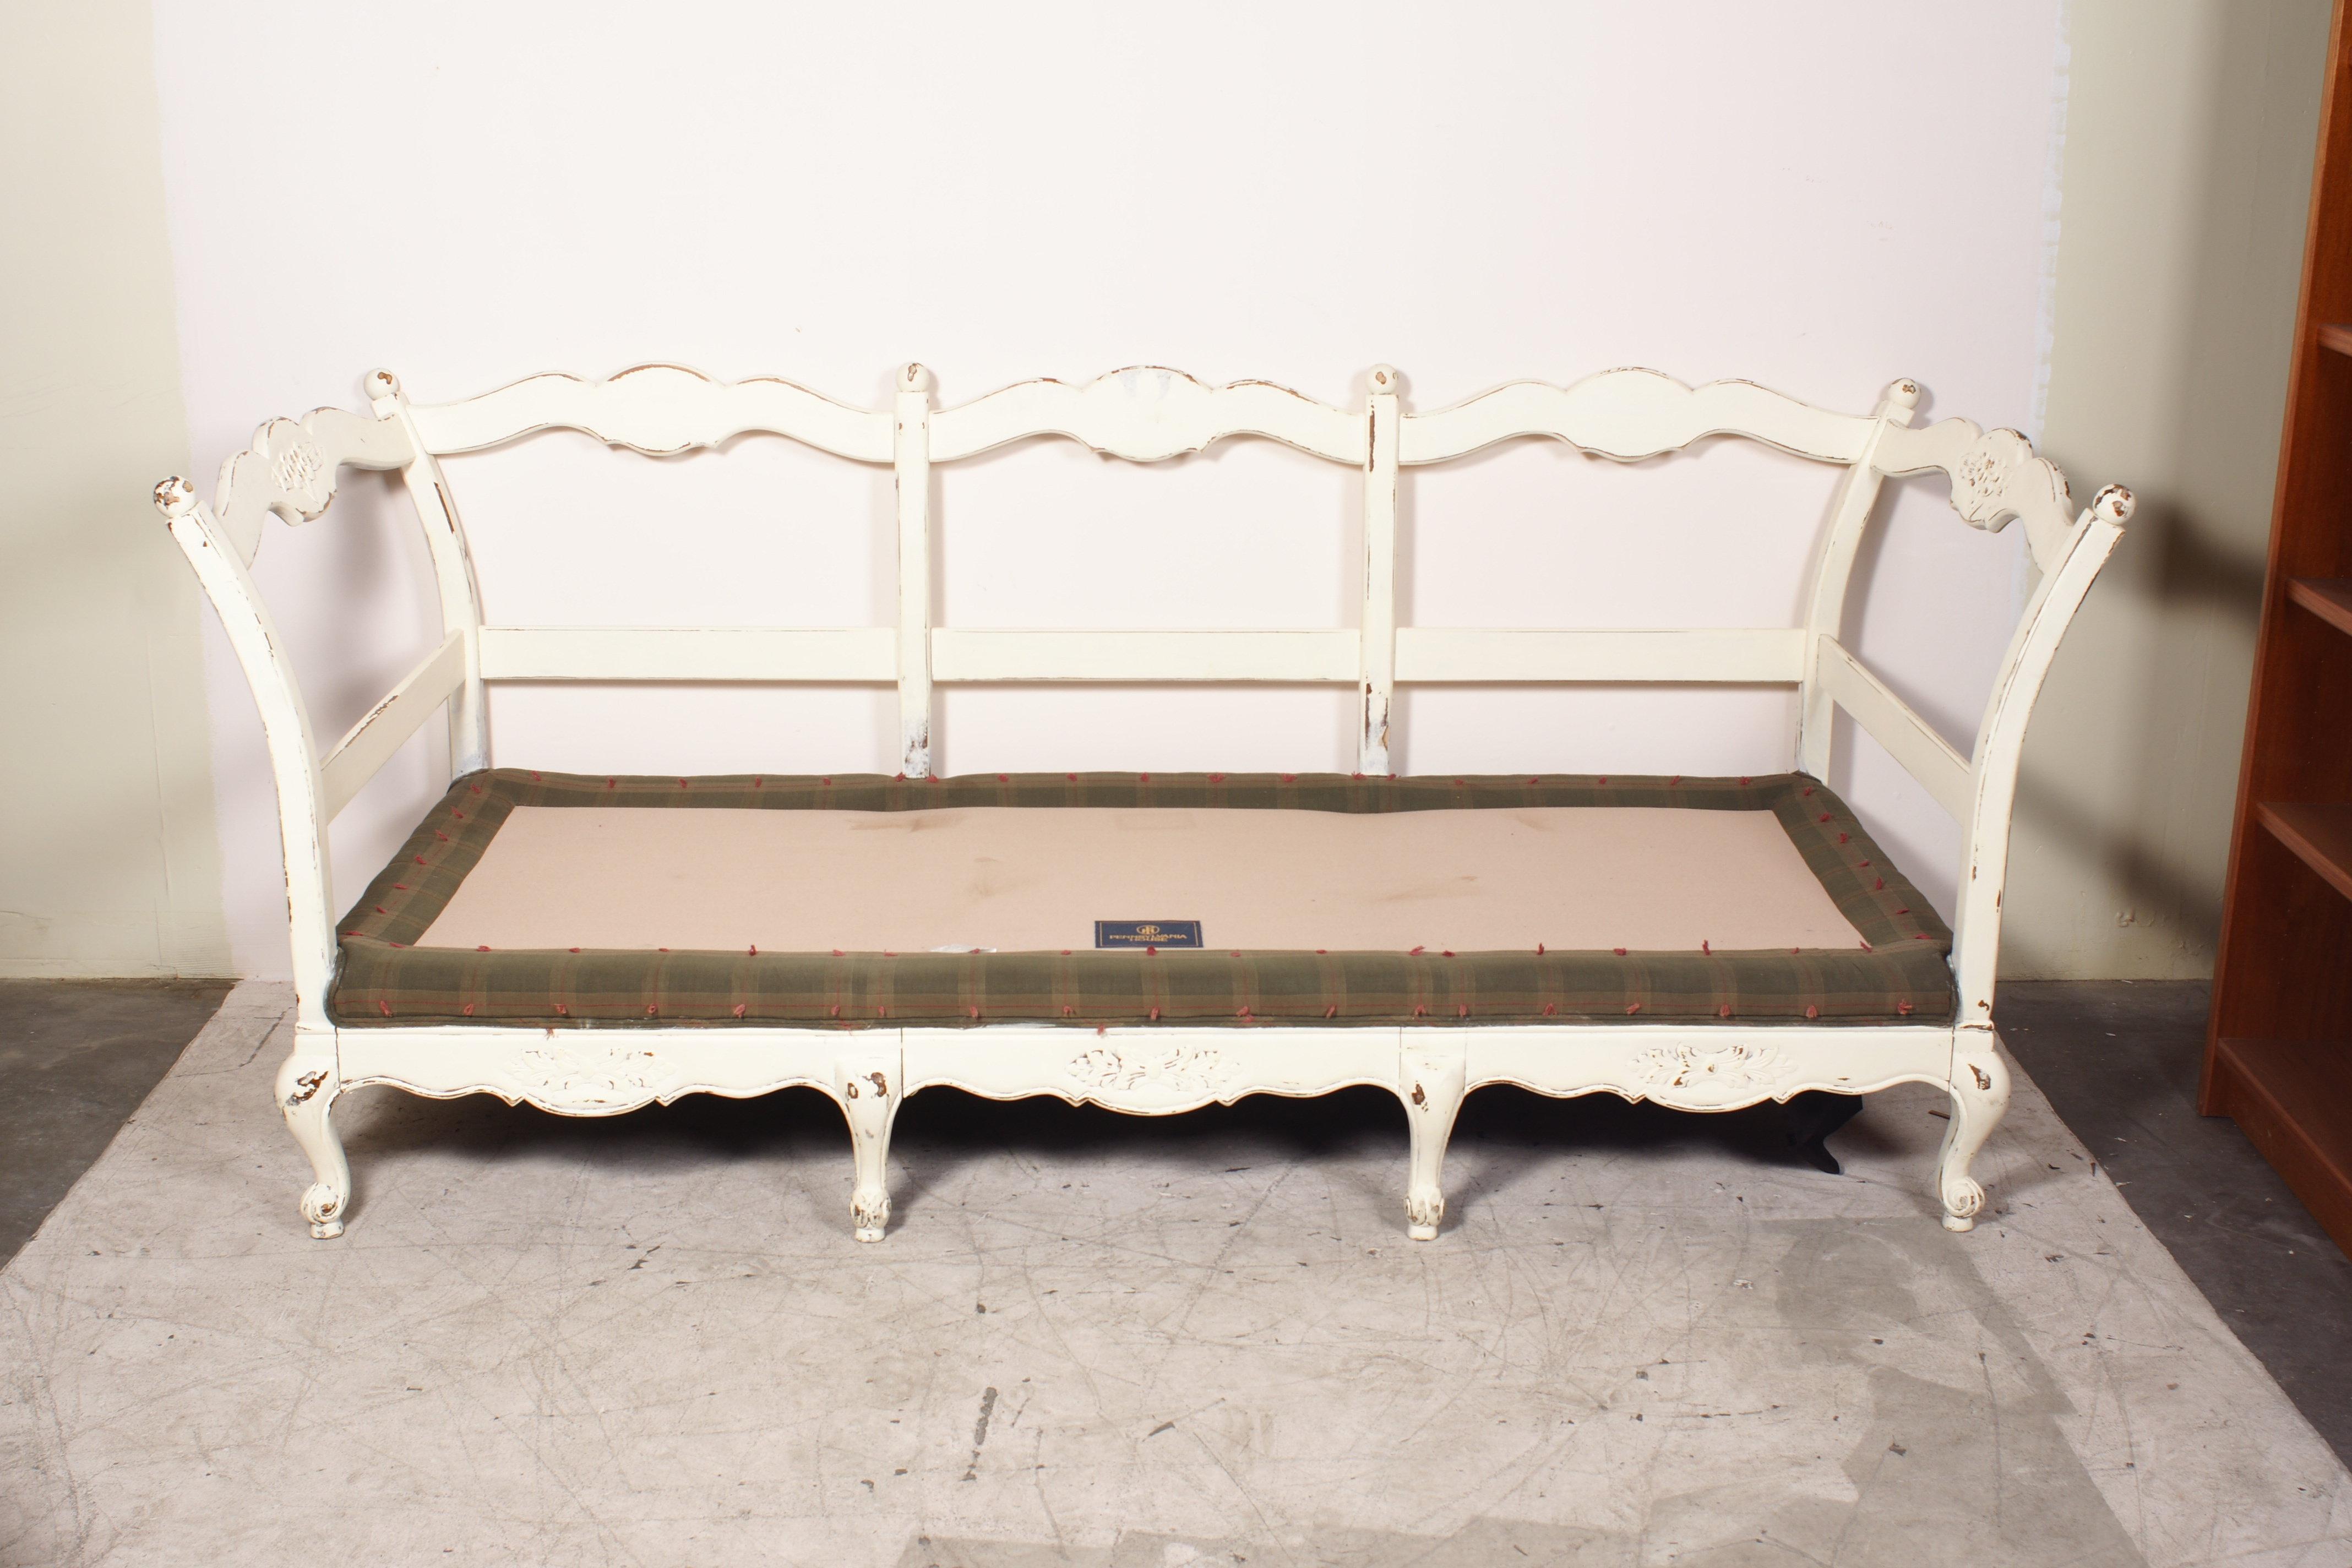 Wood Framed Rustic Plaid Sofa